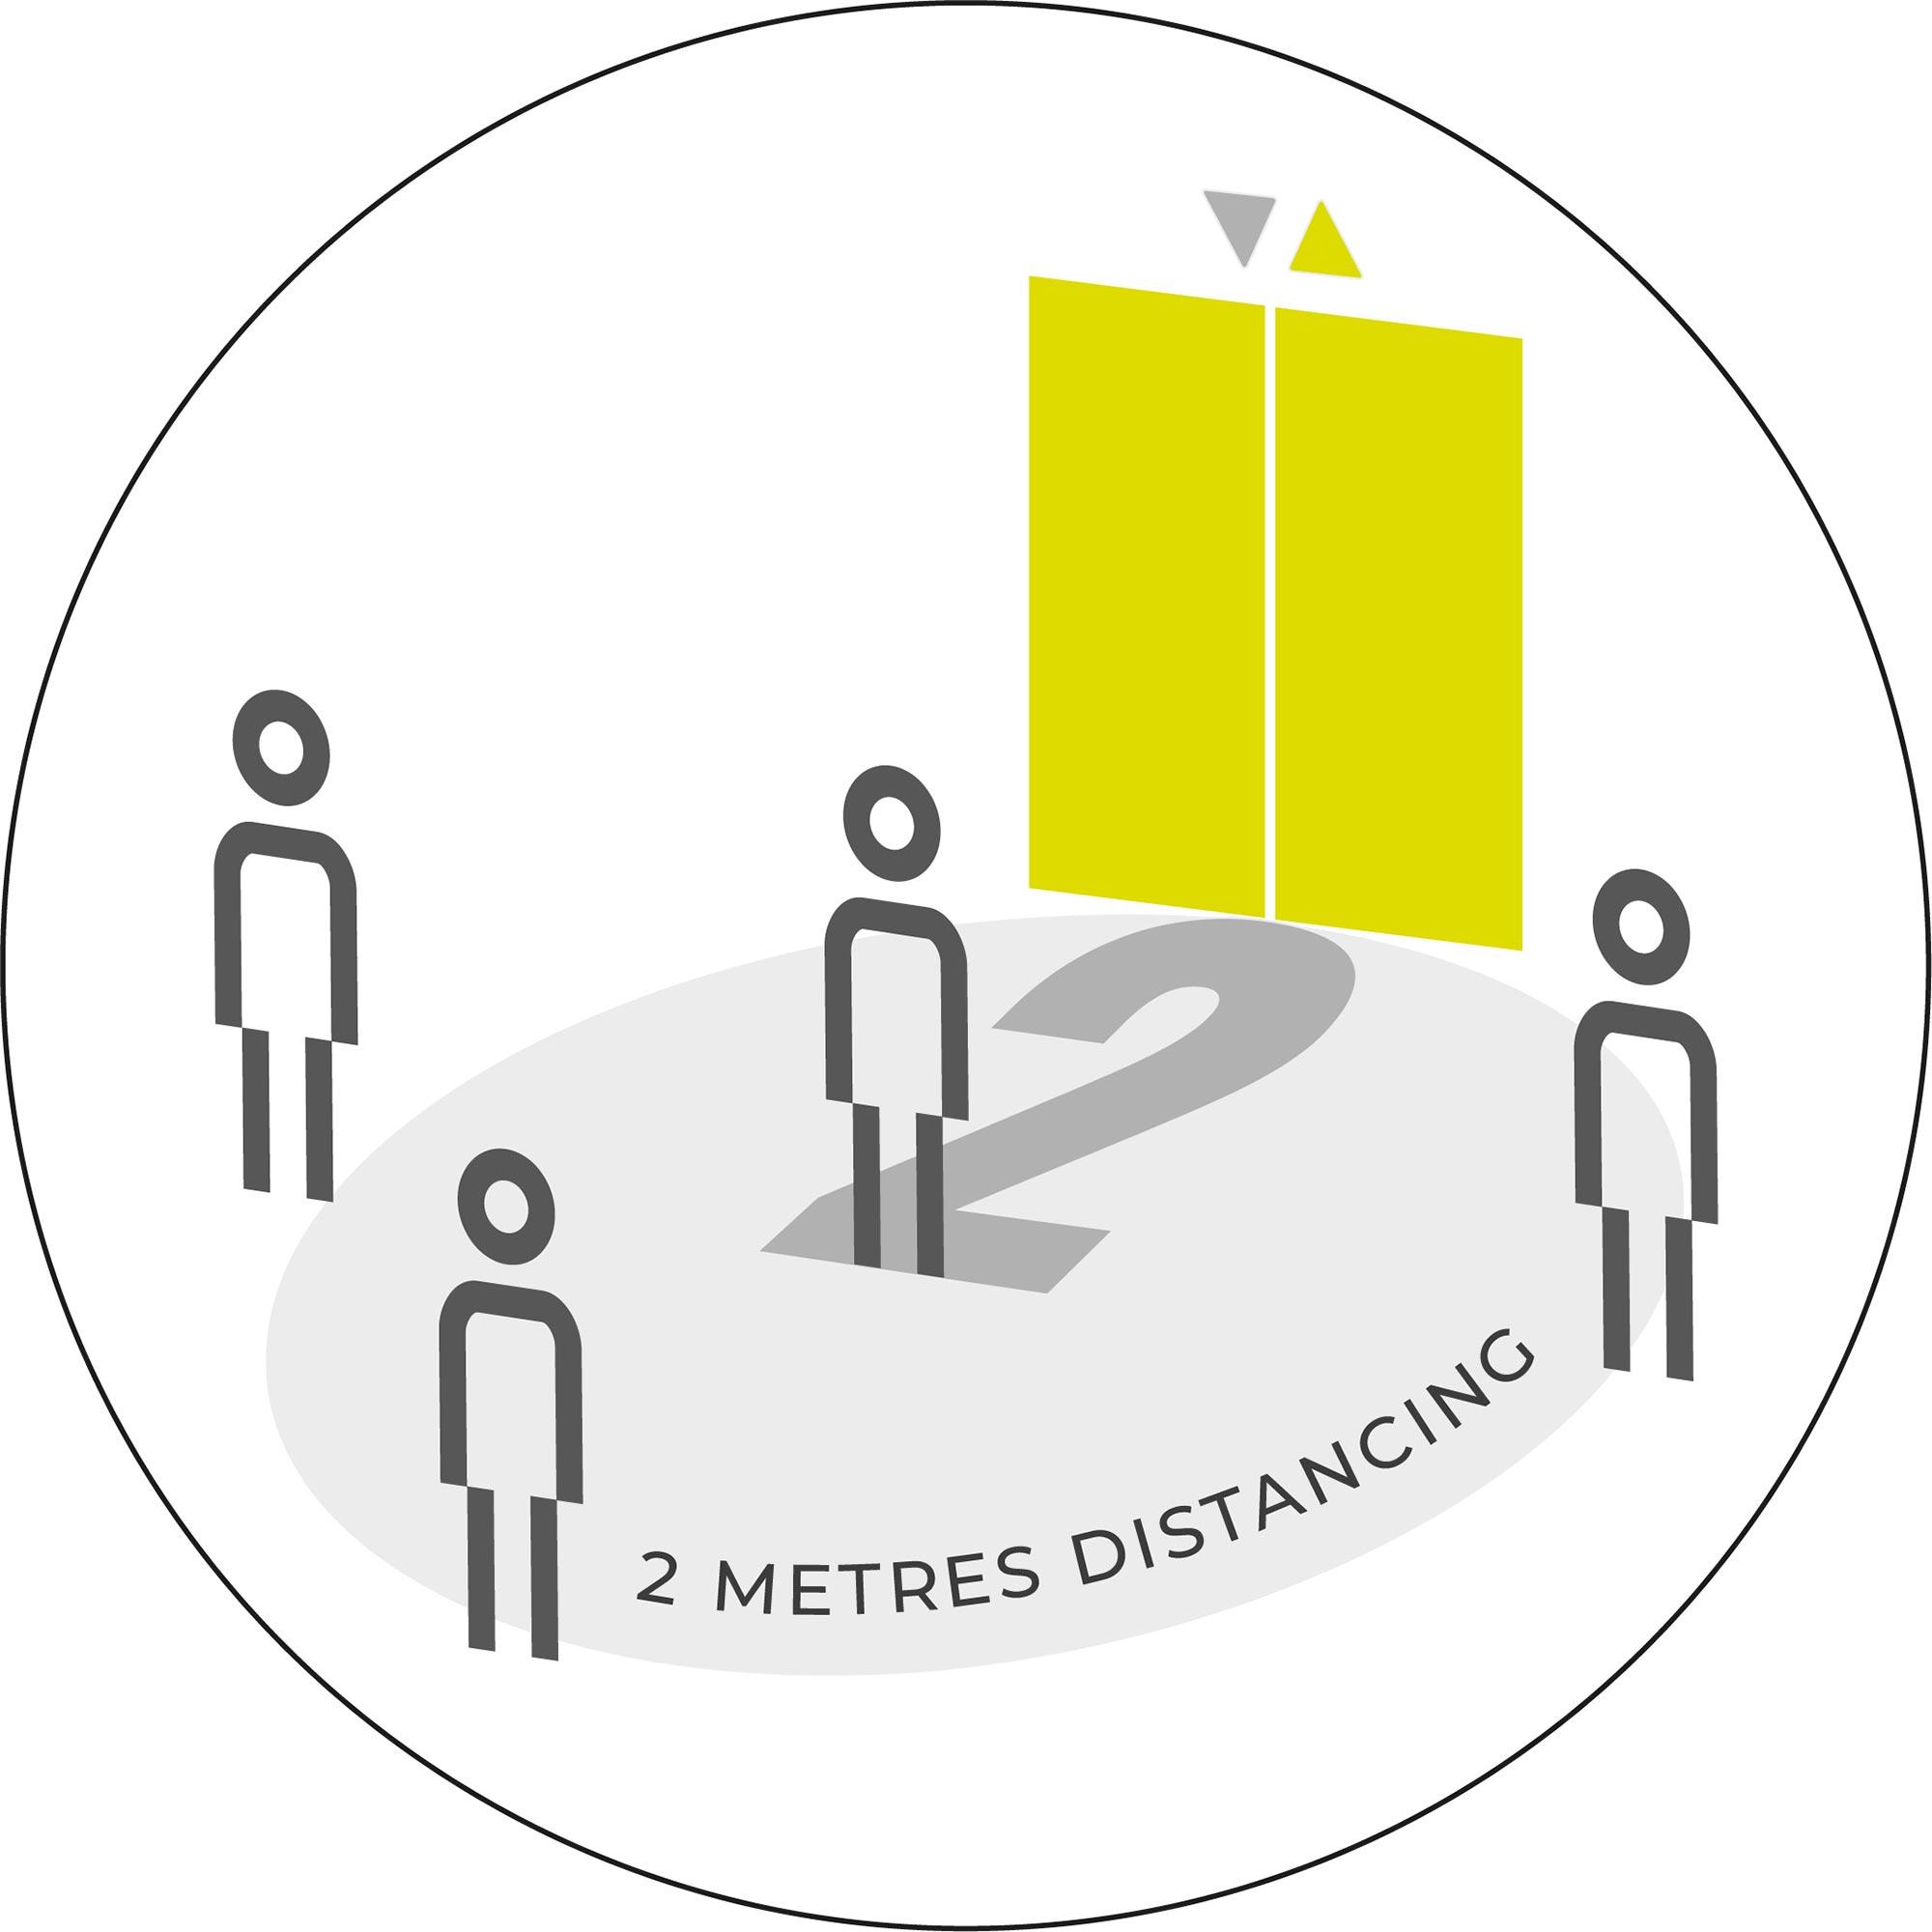 Lifts 2 Metre Distancing - White